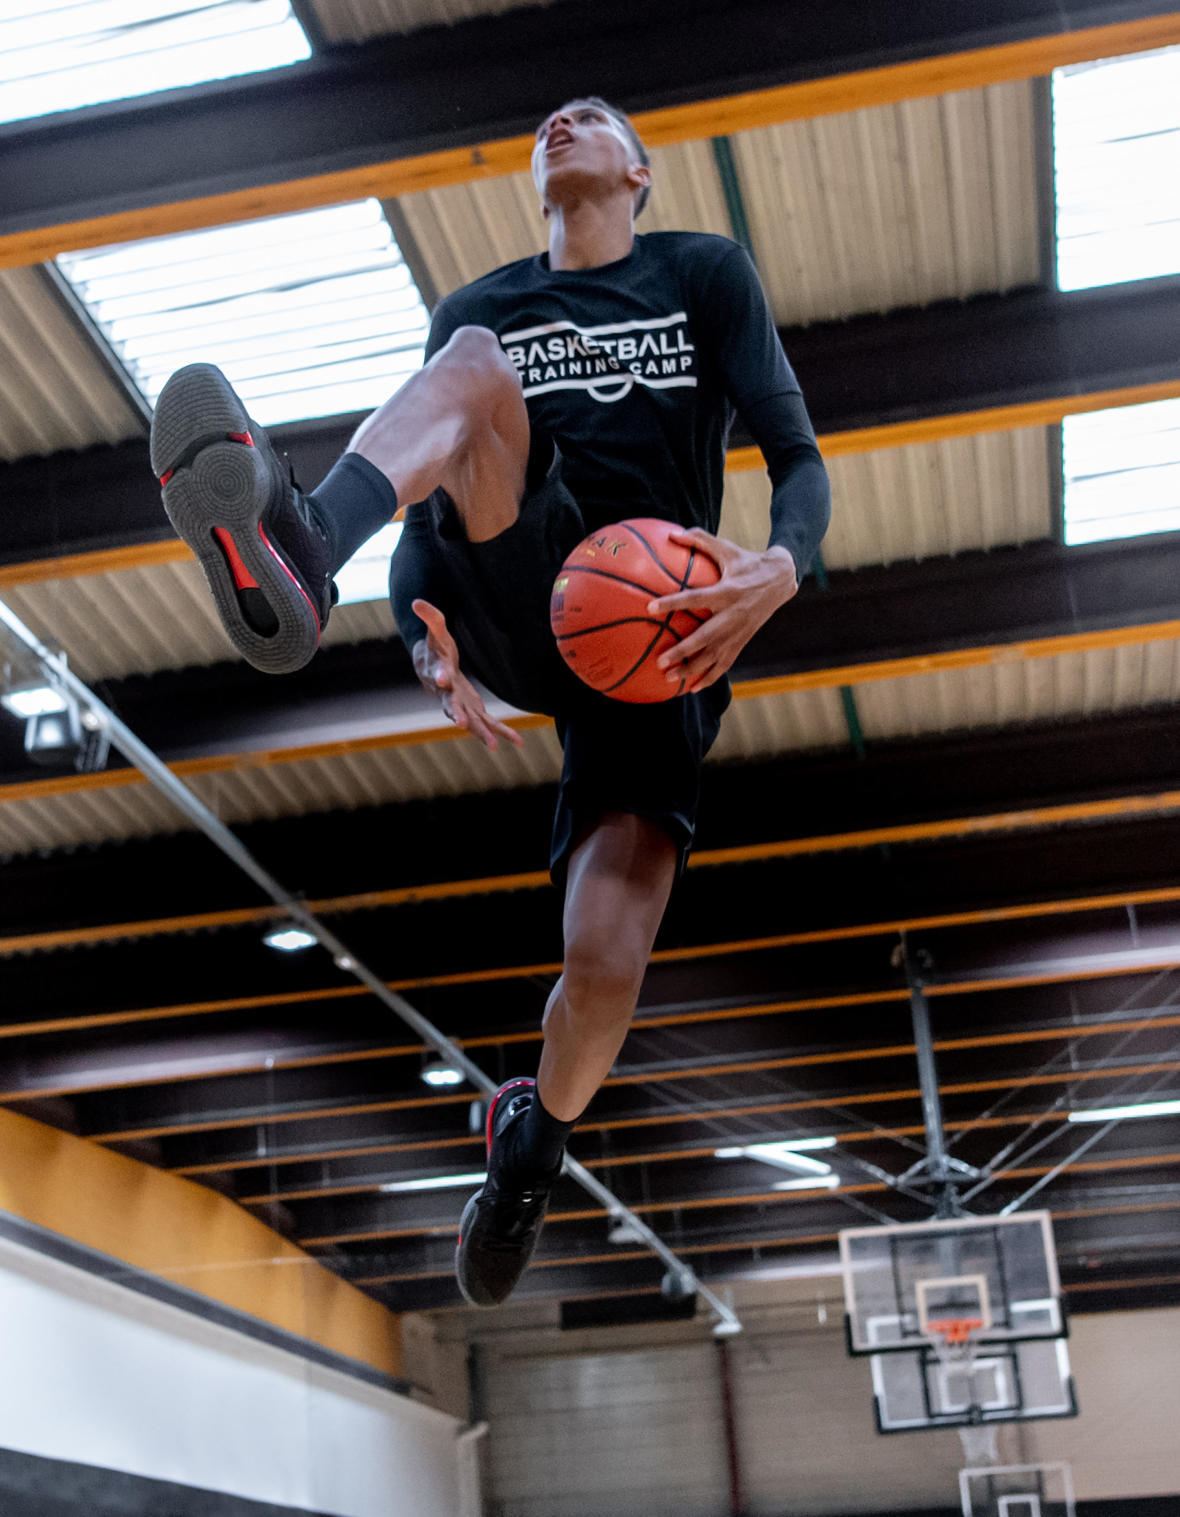 cc-basket-homme-niveau.jpg